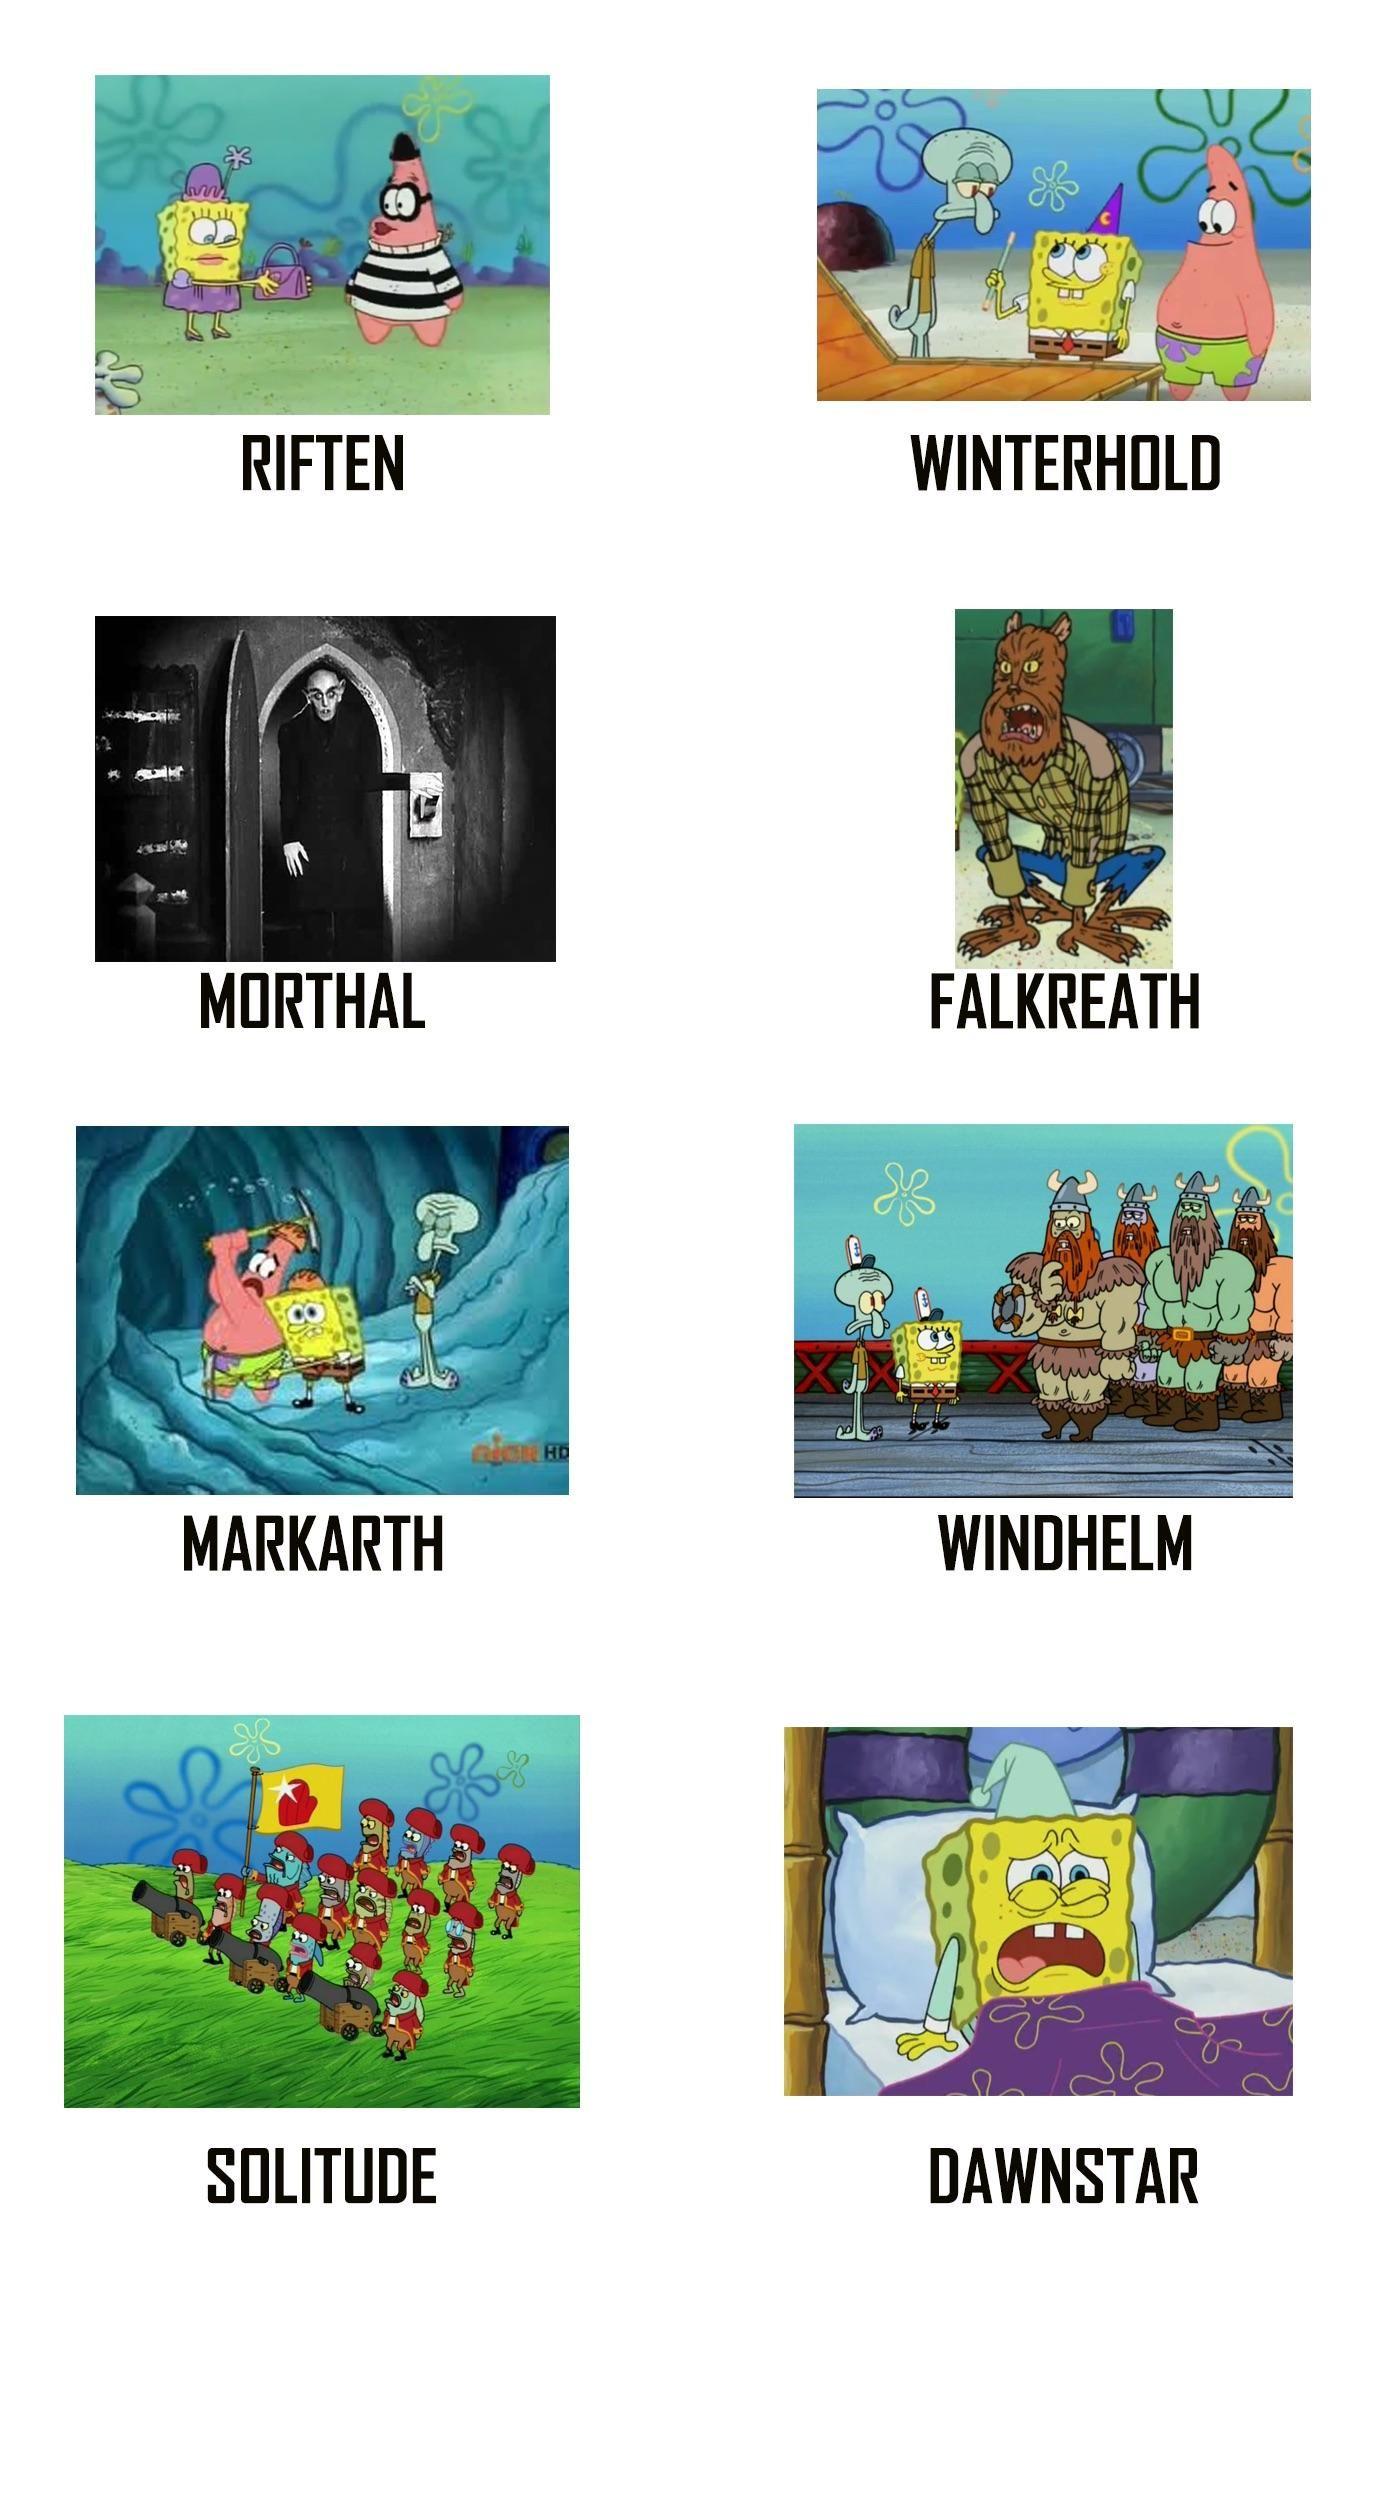 The cities of skyrim portrayed by spongebob squarepants games skyrim elderscrolls be3 gaming videogames concours ngc